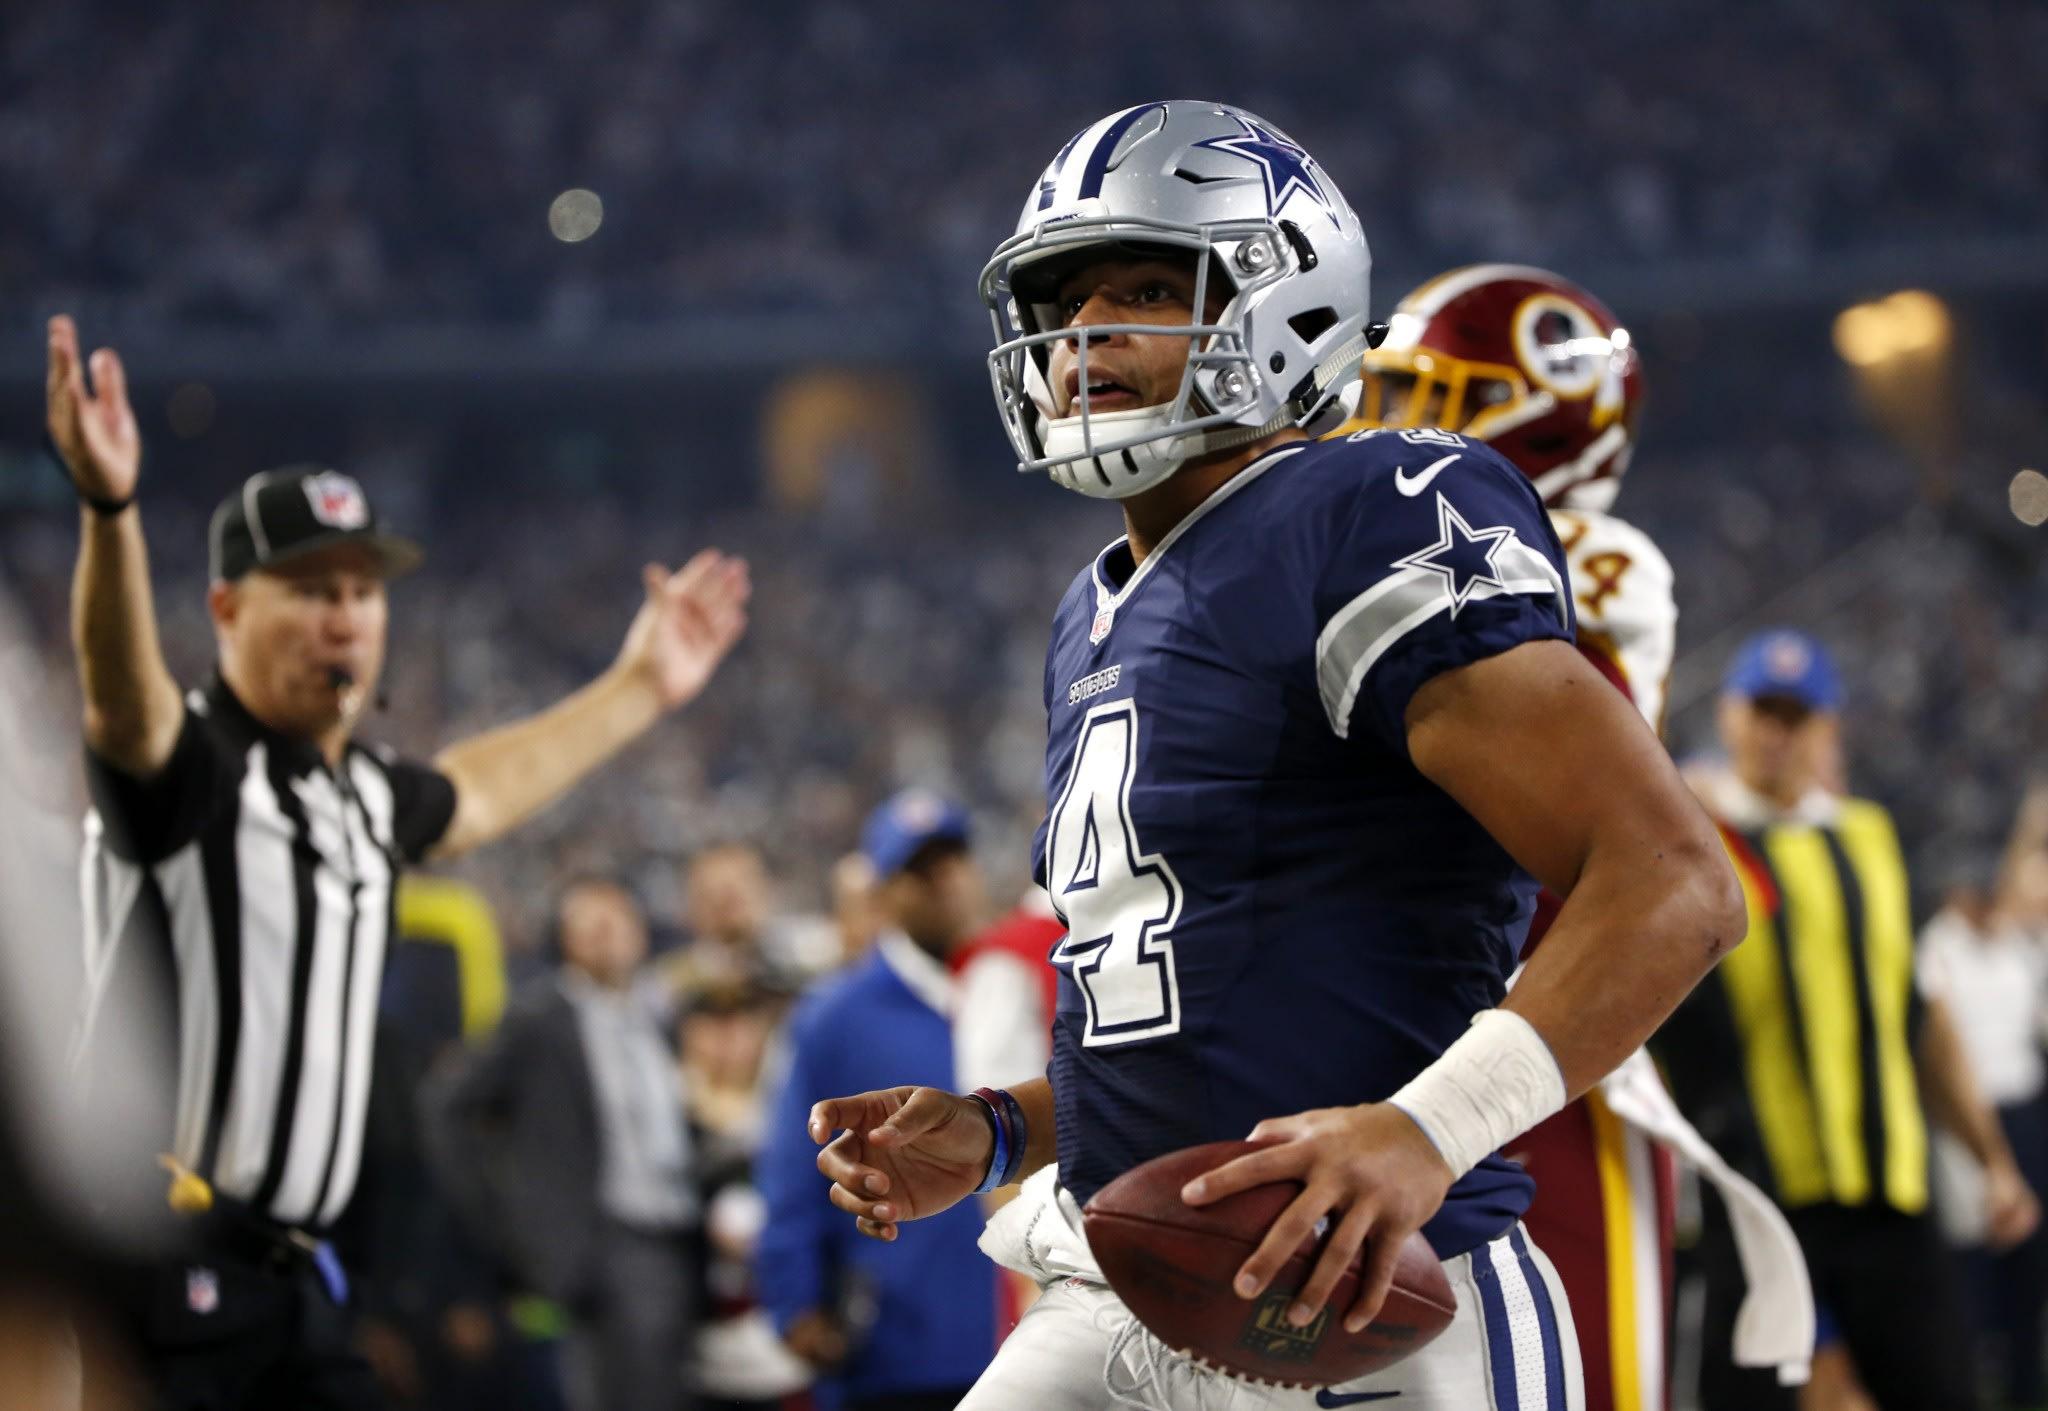 Dak Prescott played a strong game against the Washington Redskins. (AP)